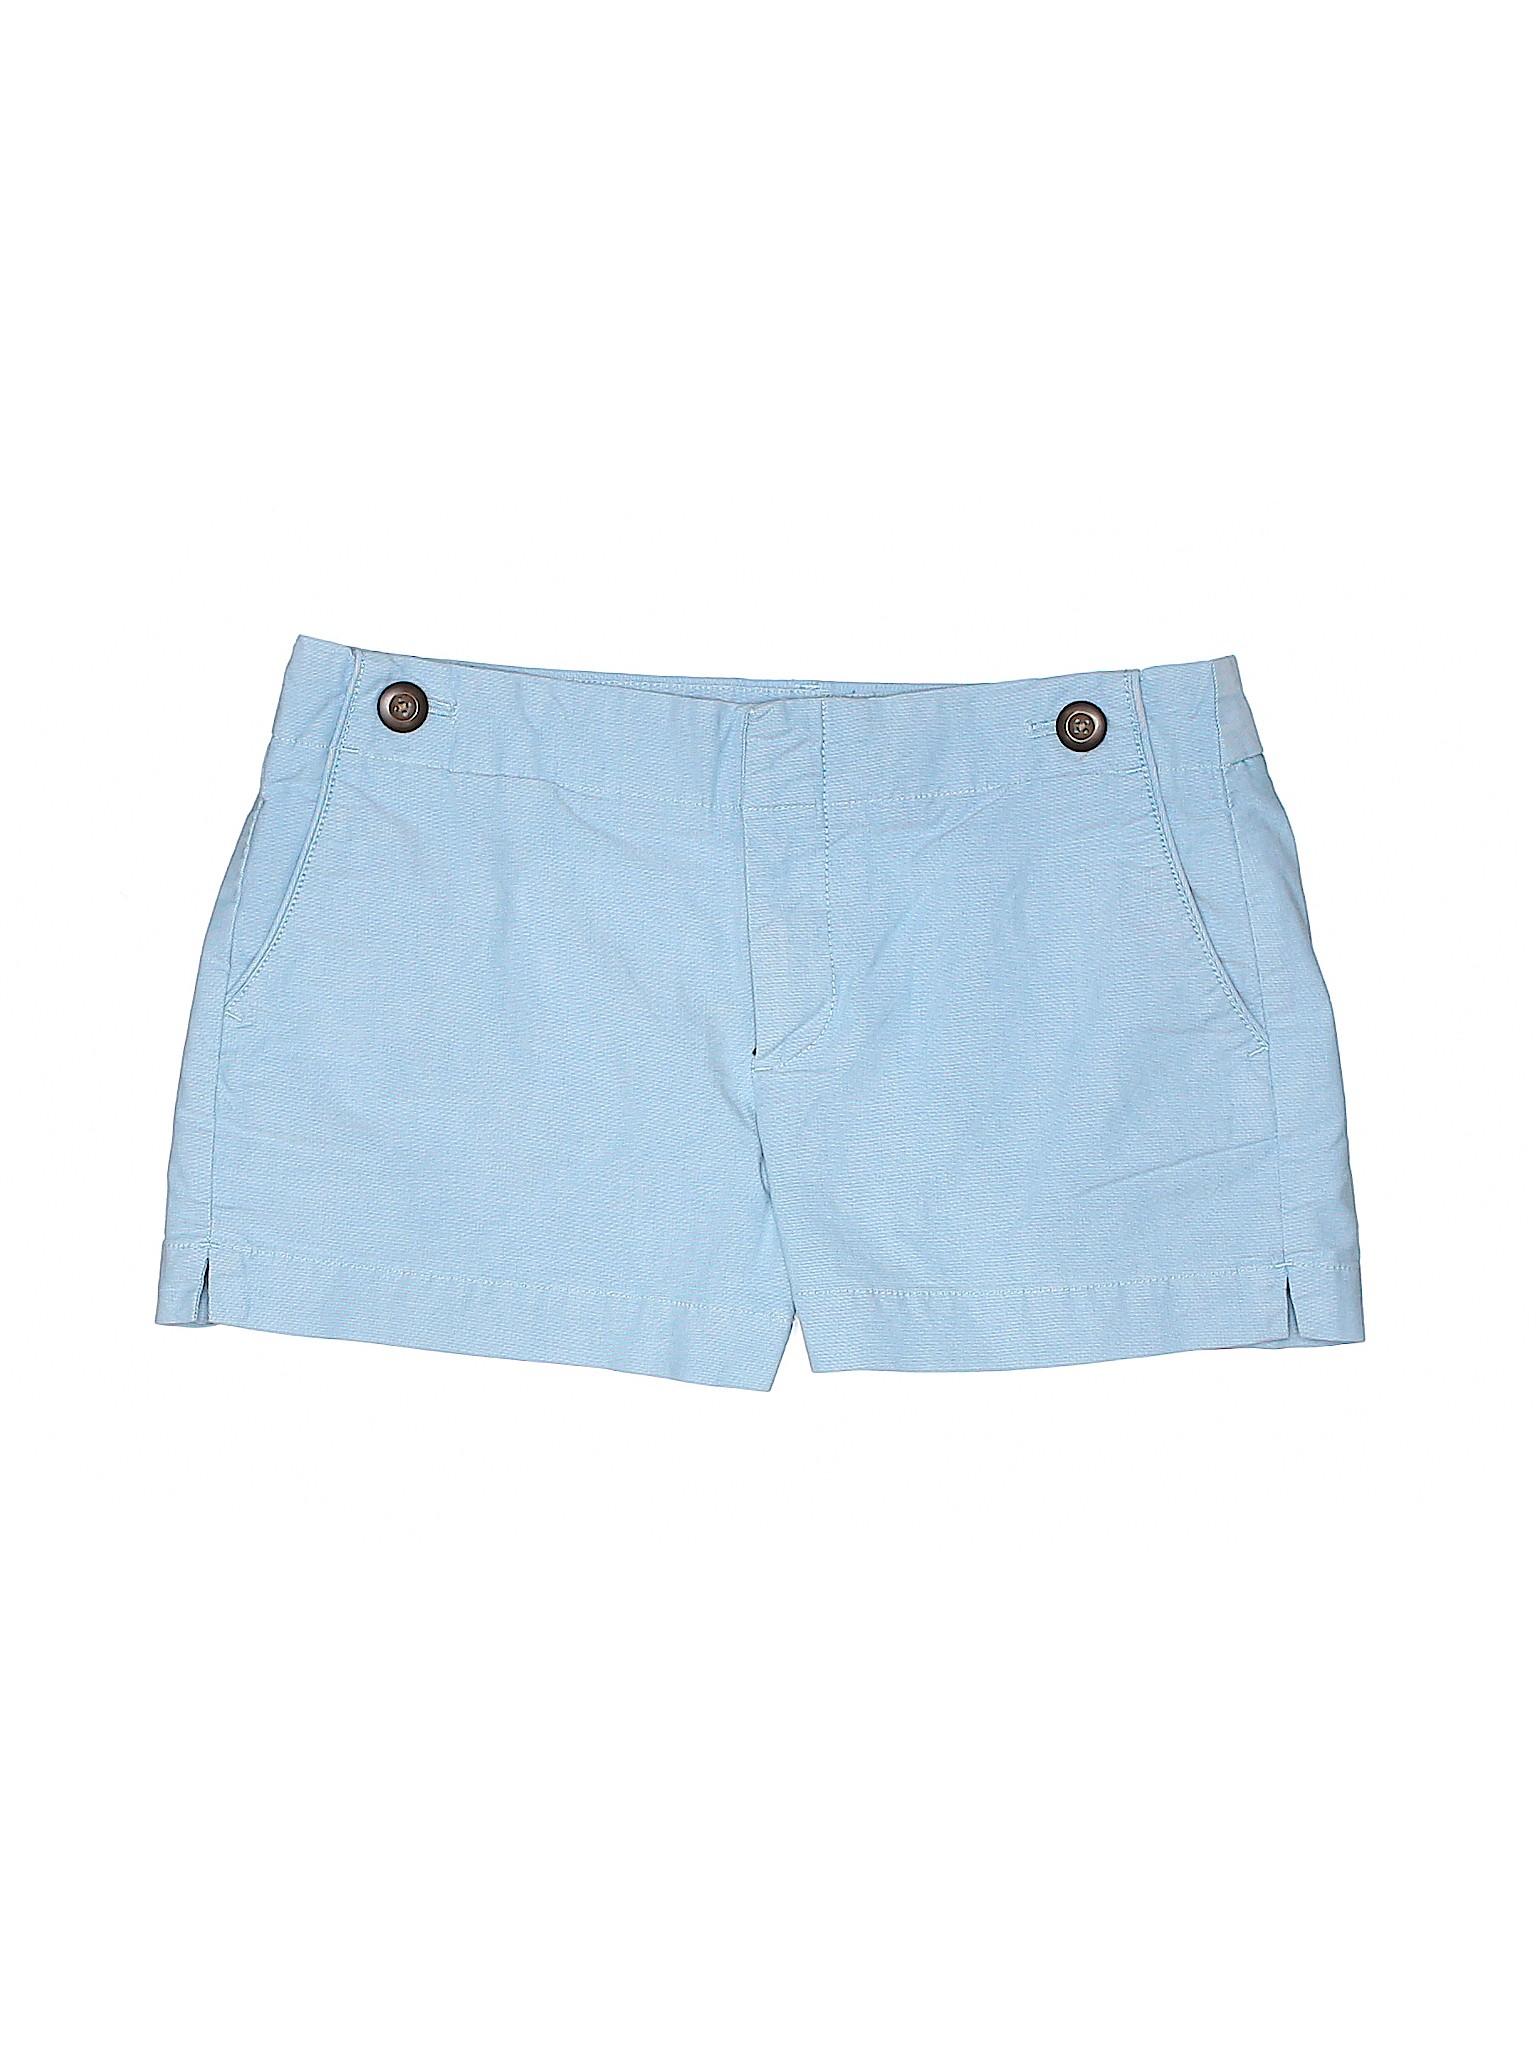 Gap Gap Shorts Khaki Khaki Boutique Boutique qTtwUO